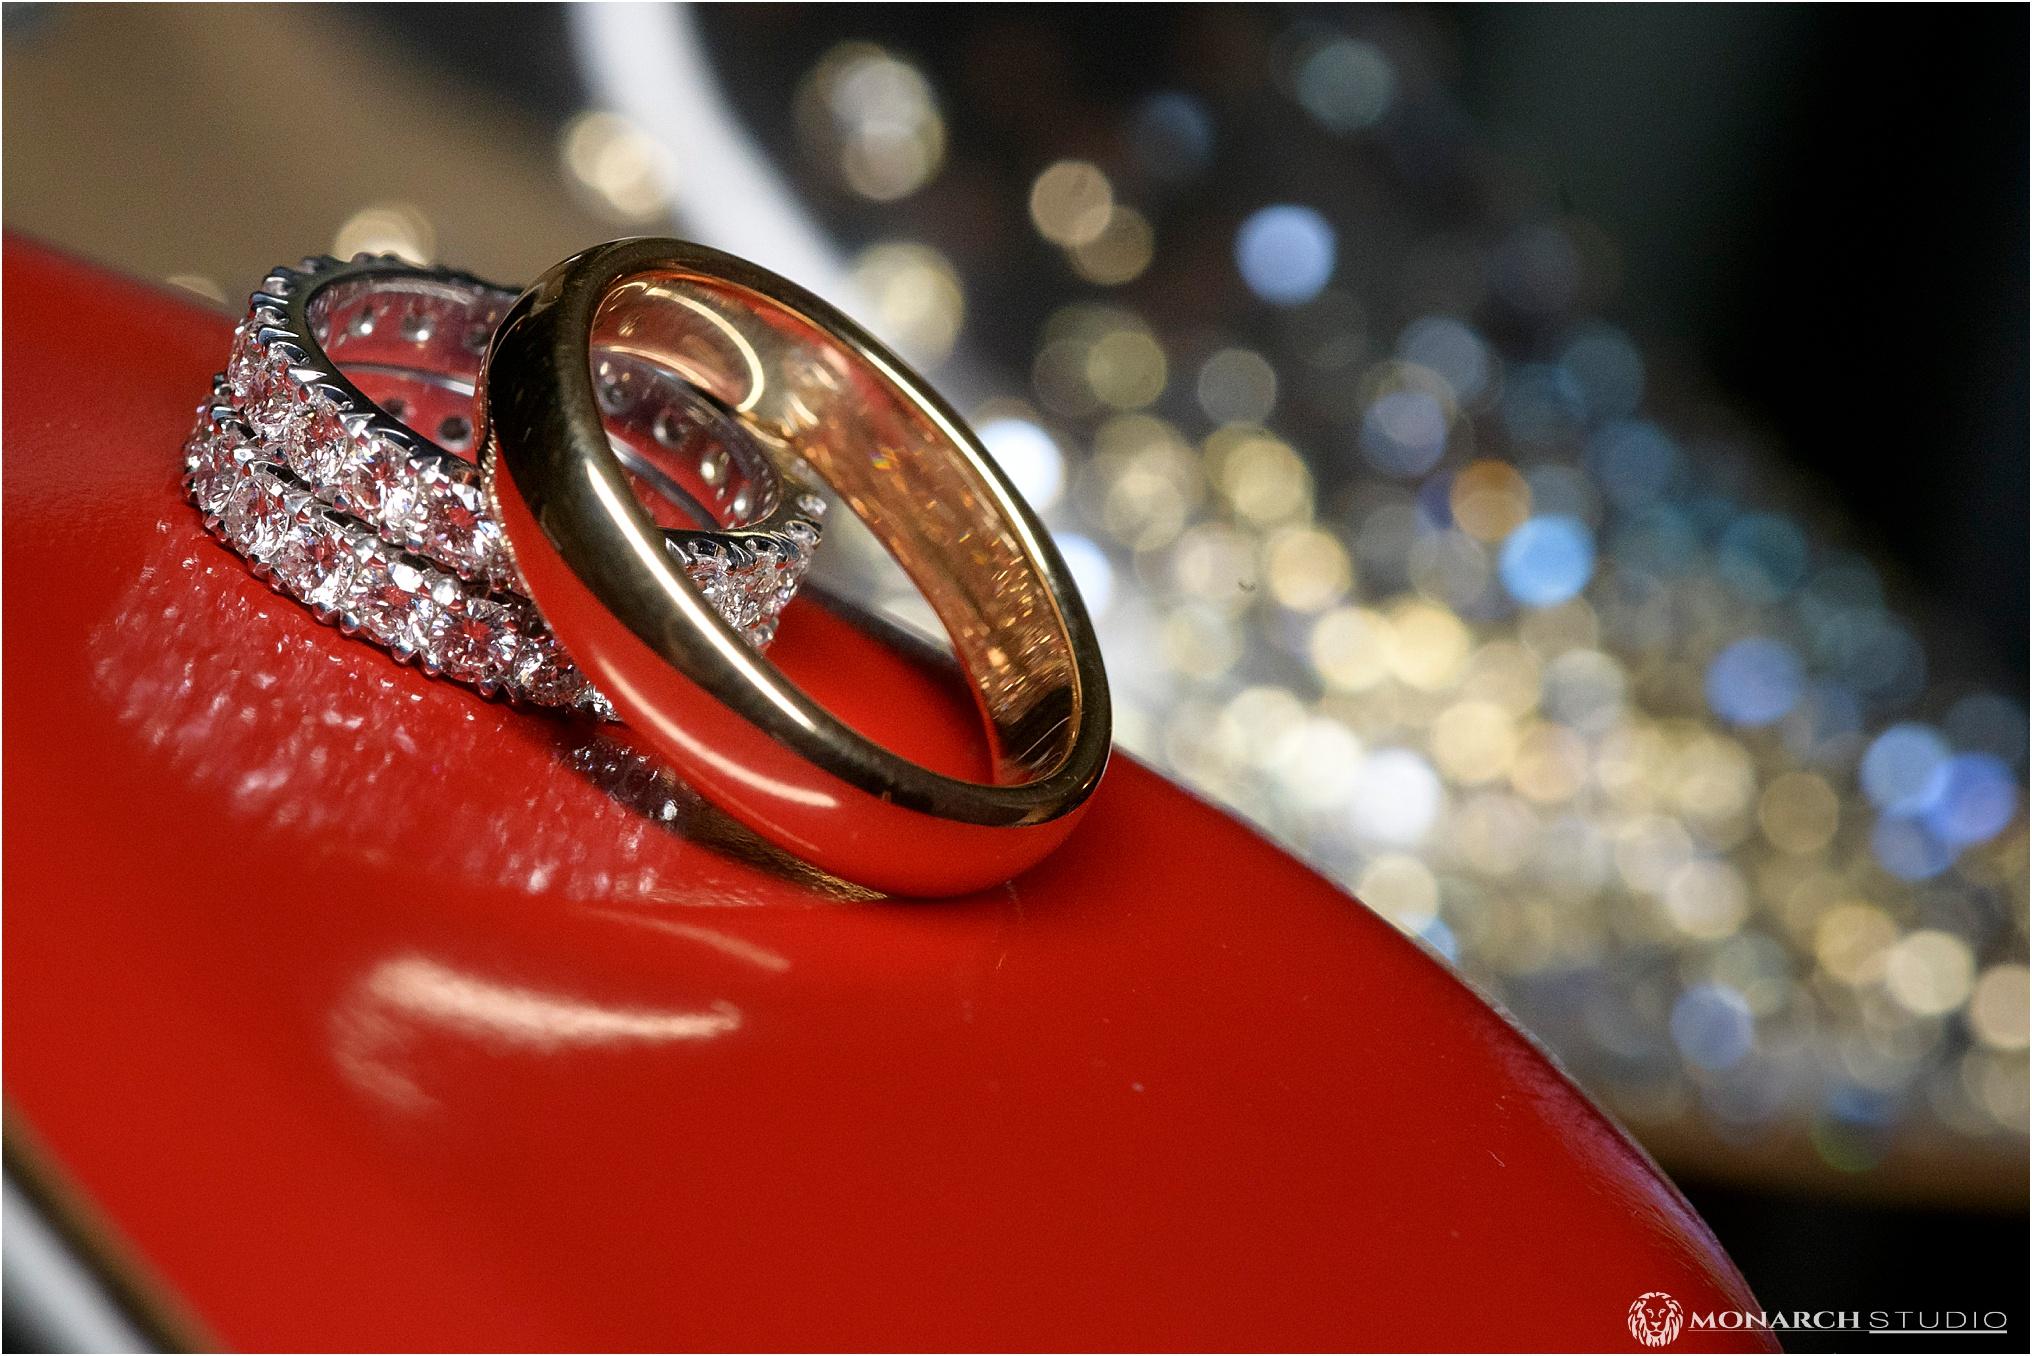 st-augustine-high-end-wedding-photographers-010.jpg